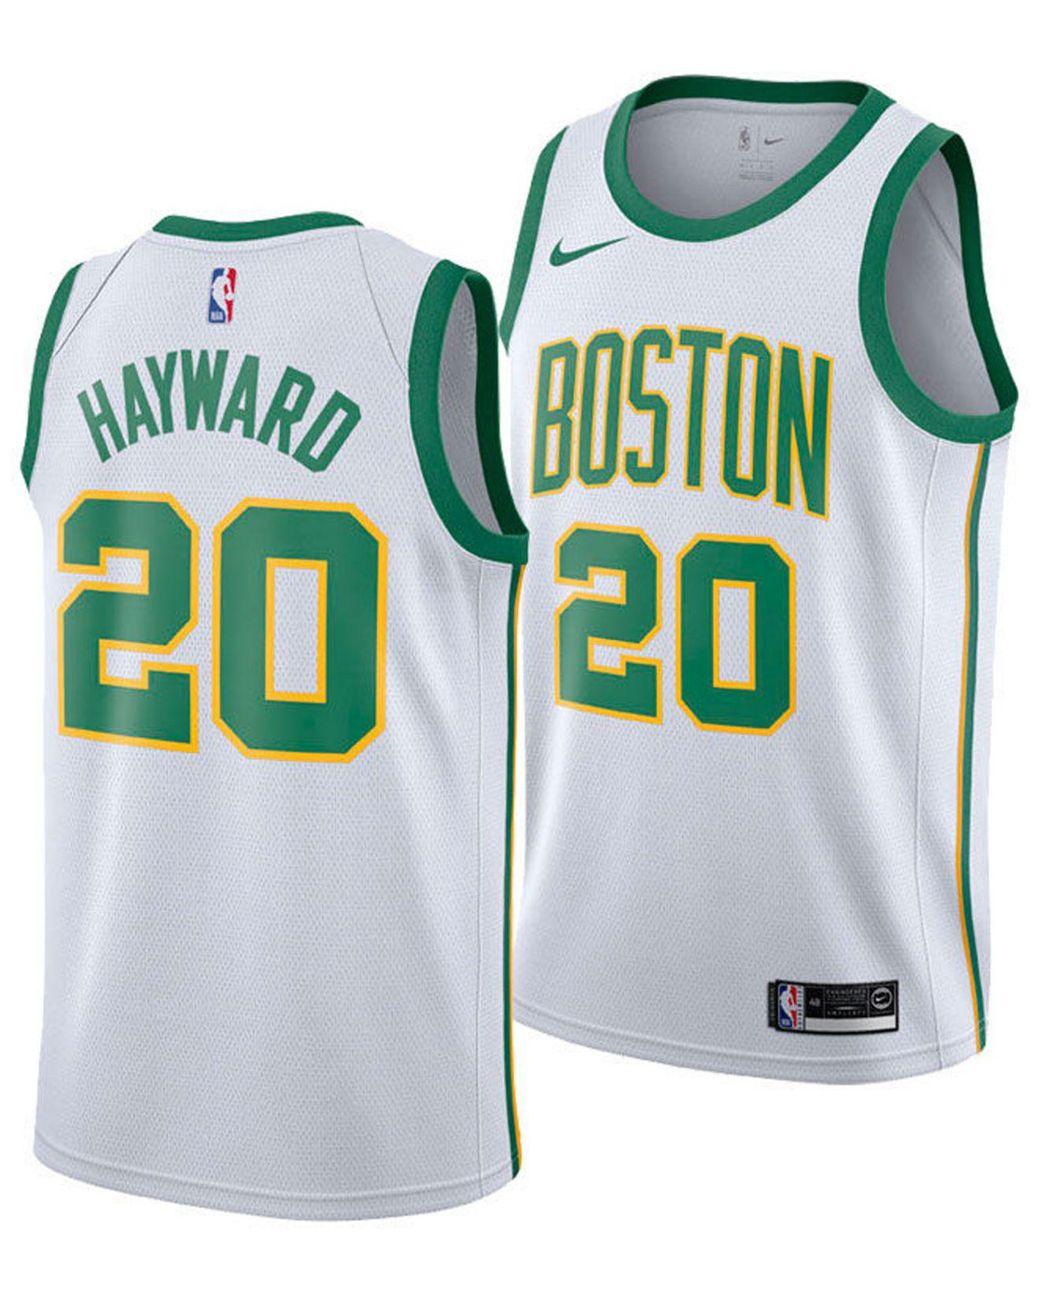 promo code ec438 42778 Men's White Gordon Hayward Boston Celtics City Swingman Jersey 2018